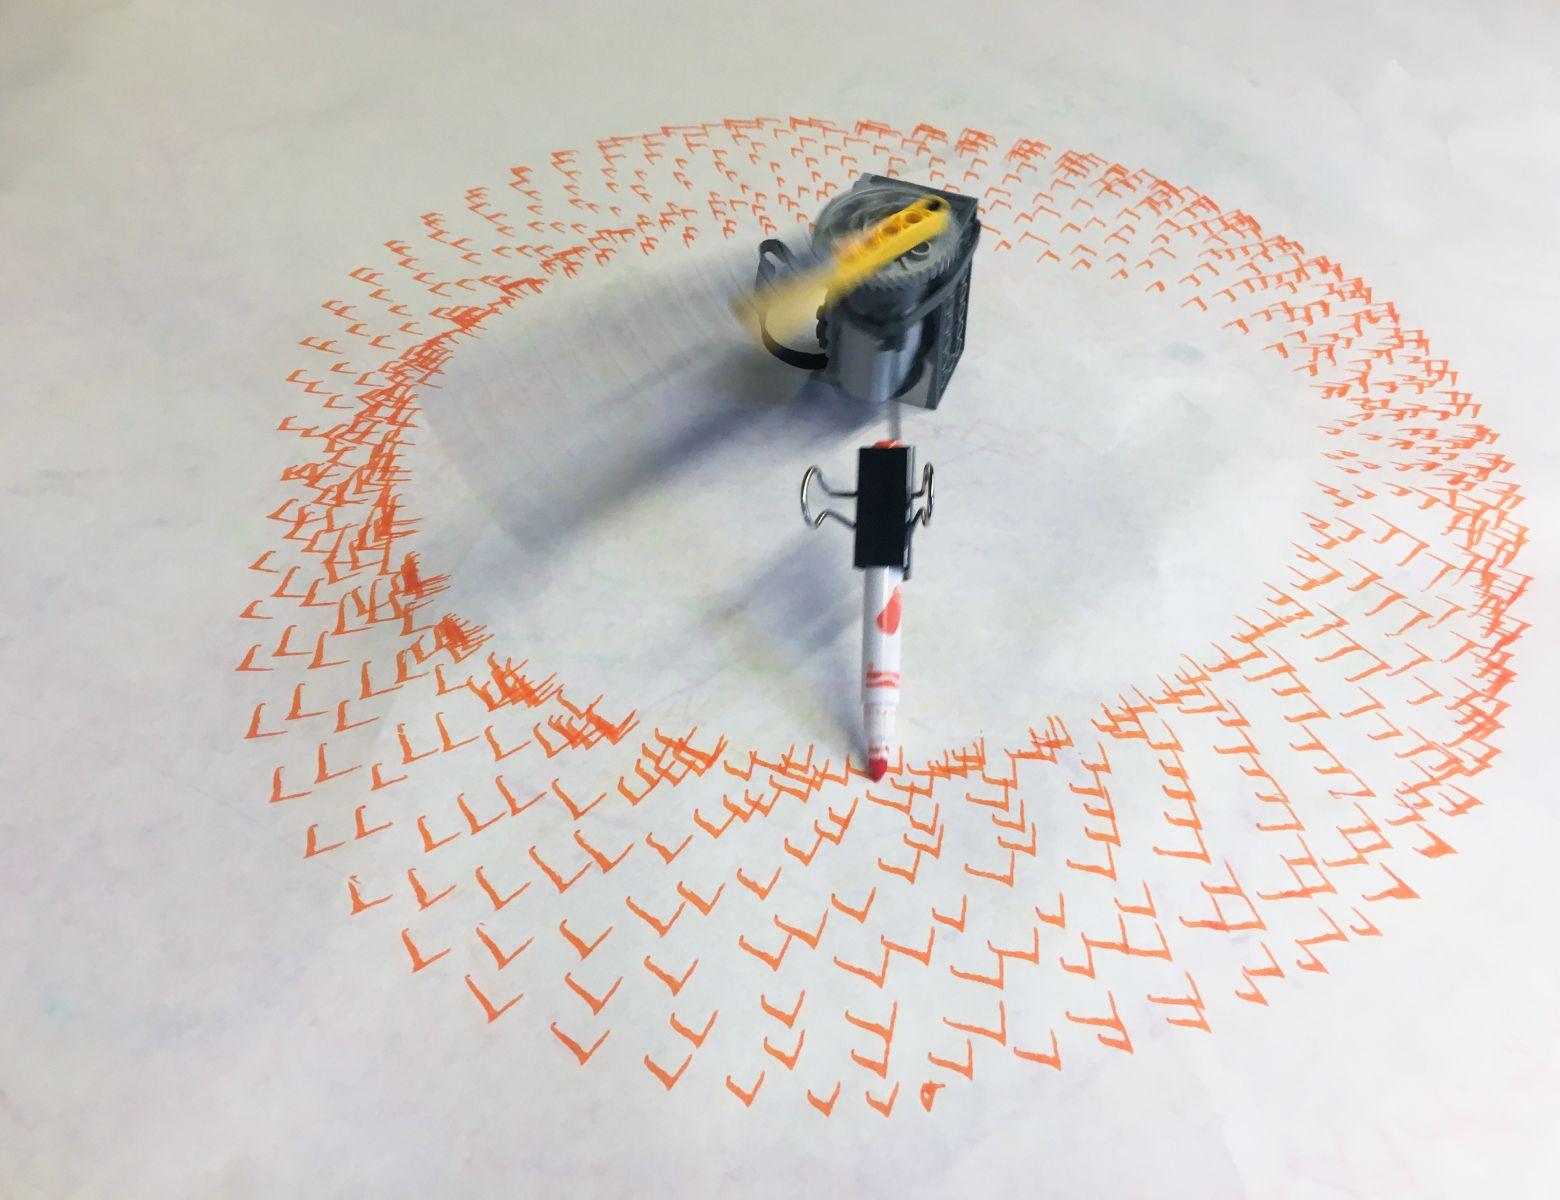 LEGO Art Machines